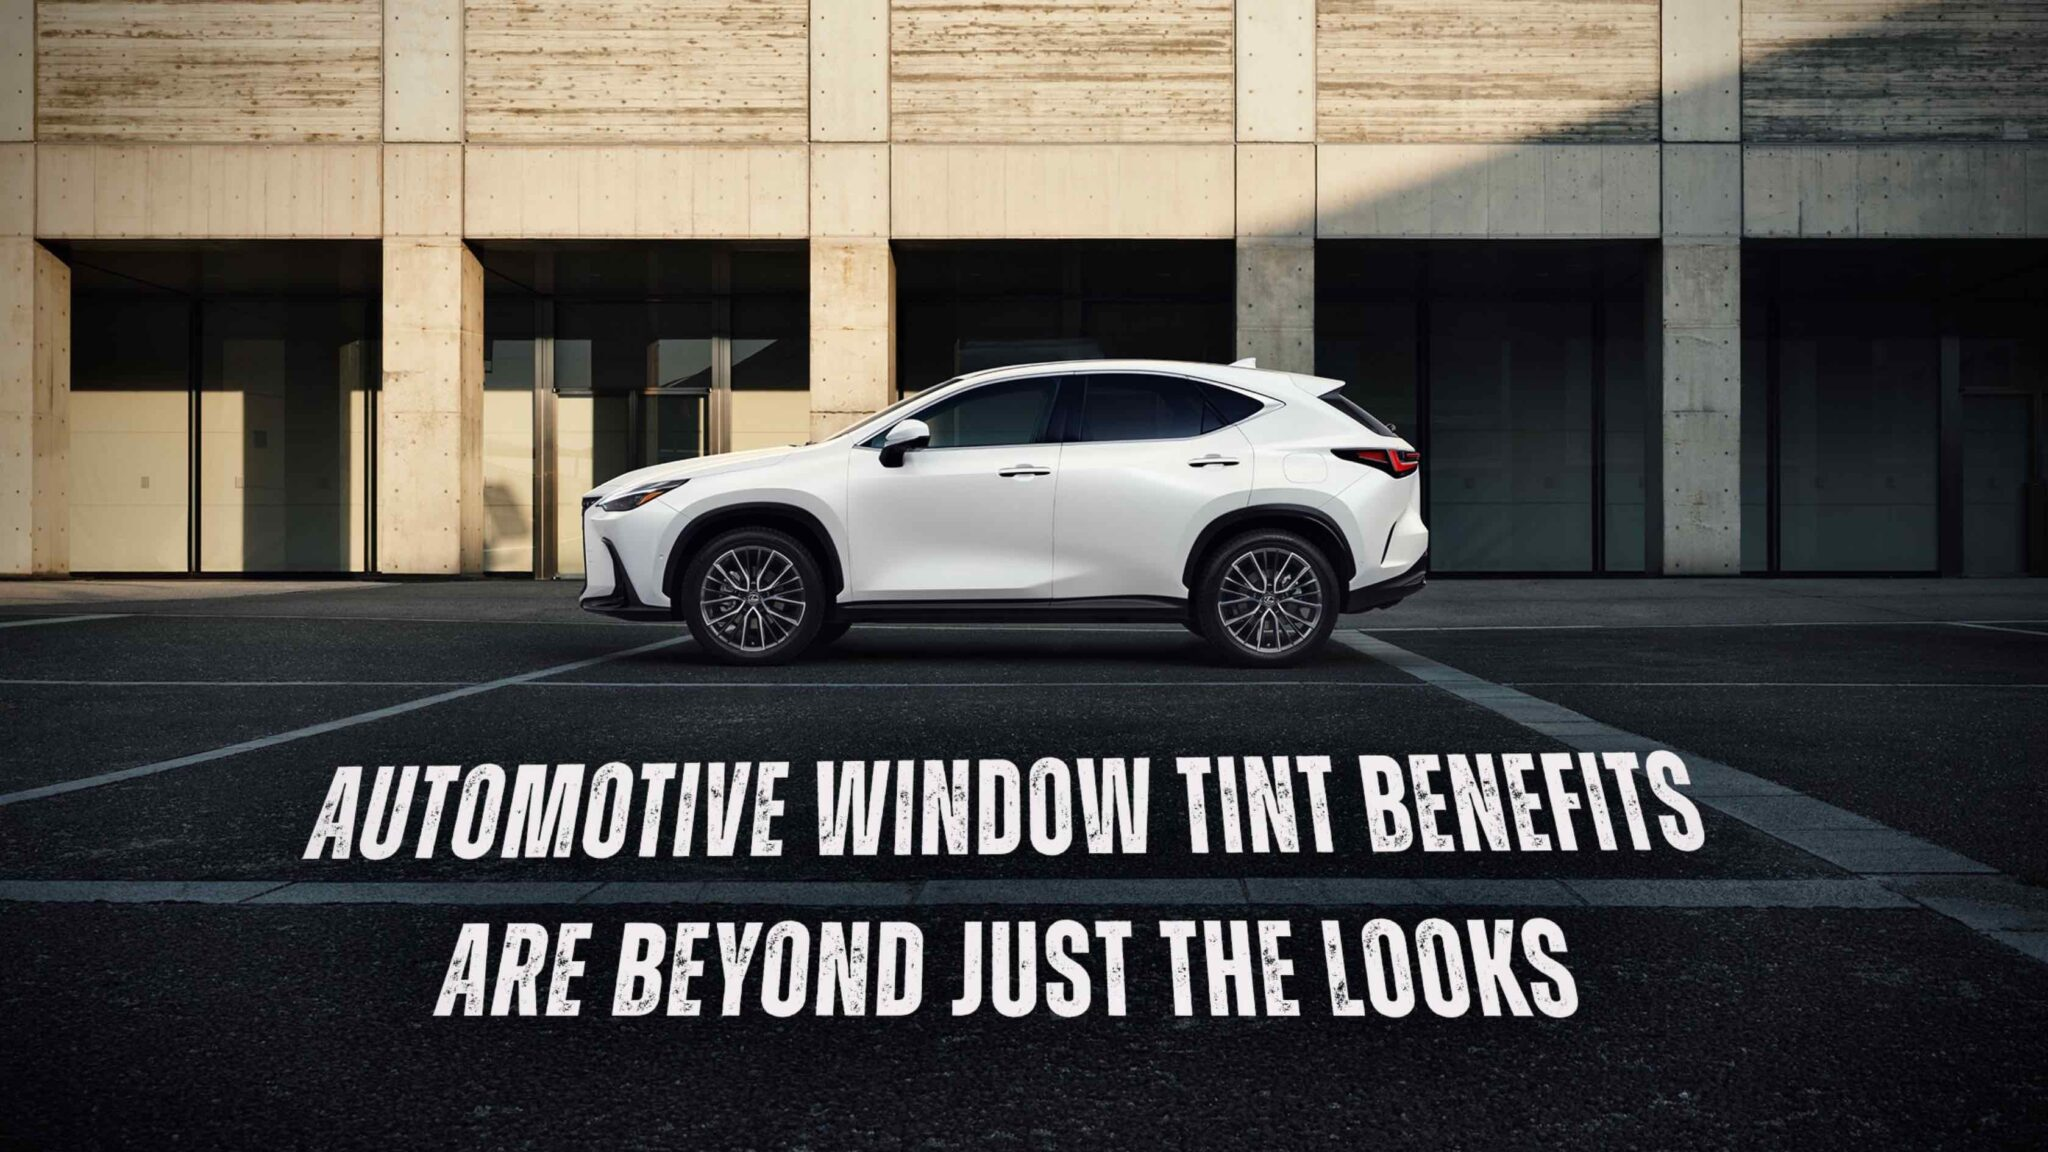 Automotive Window Tint Benefits Are Beyond Just The Looks - Automotive Window Tinting in the Grand Rapids, Michigan Area